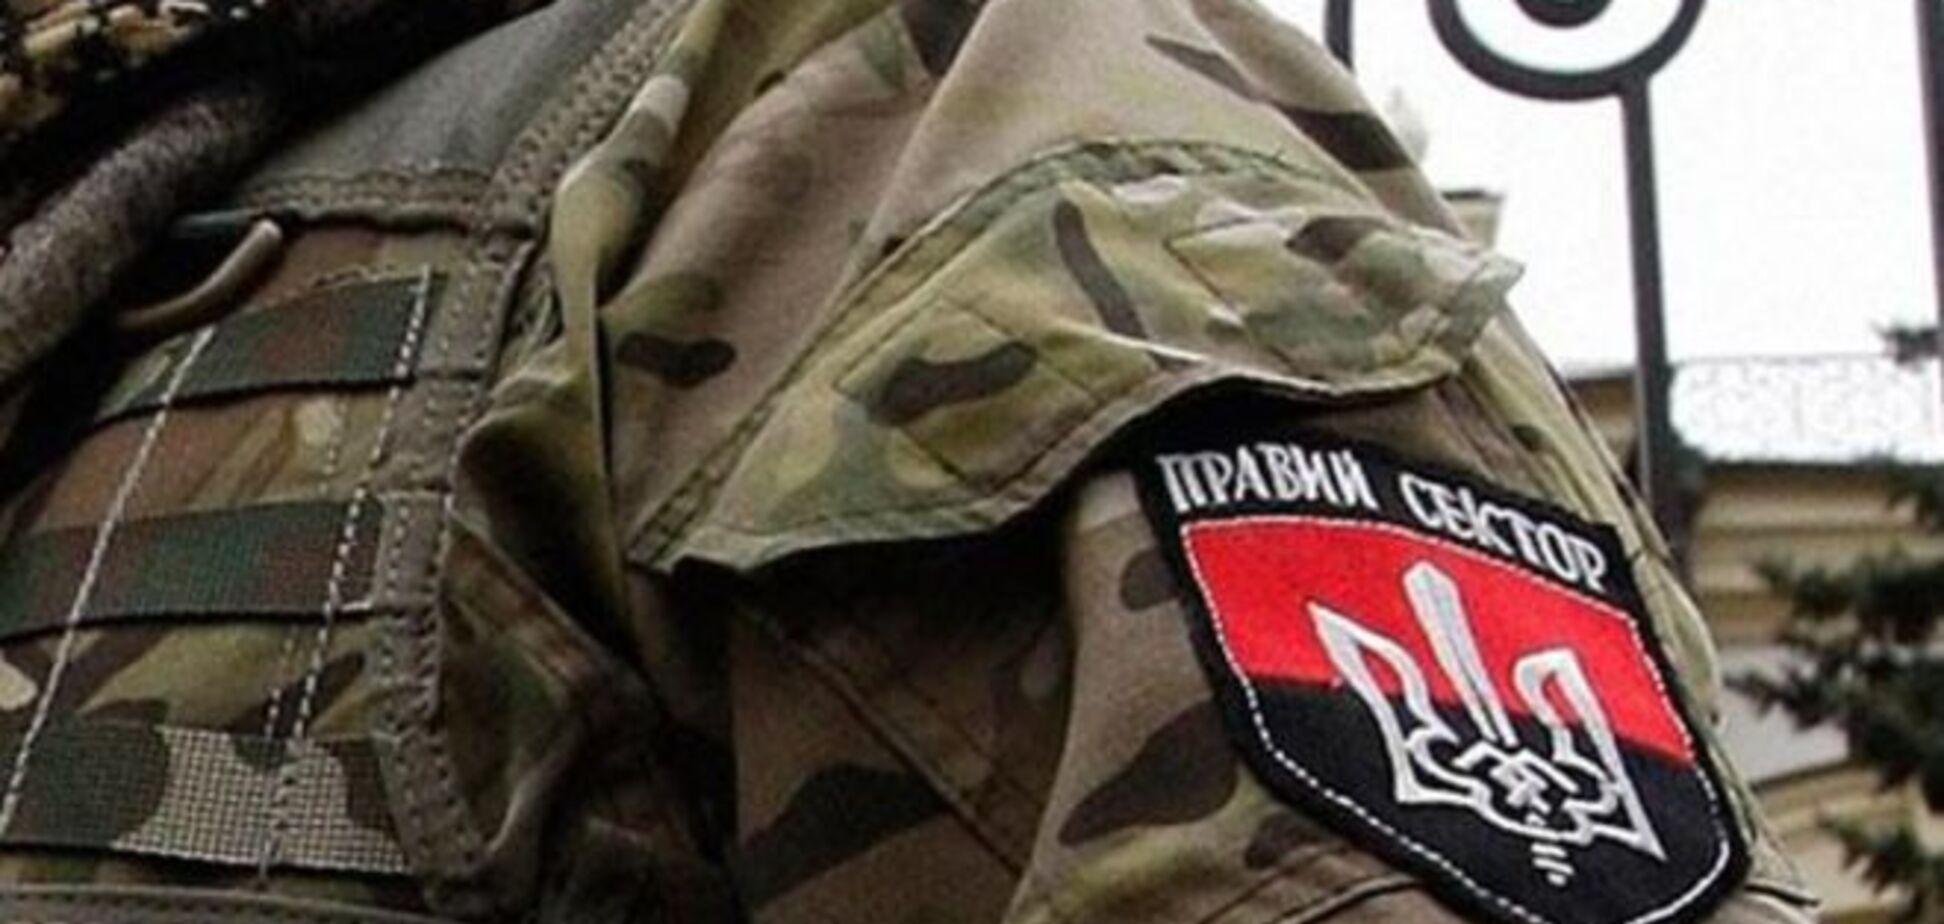 'Правий сектор' на контакт не йде - голова Закарпатської ОДА